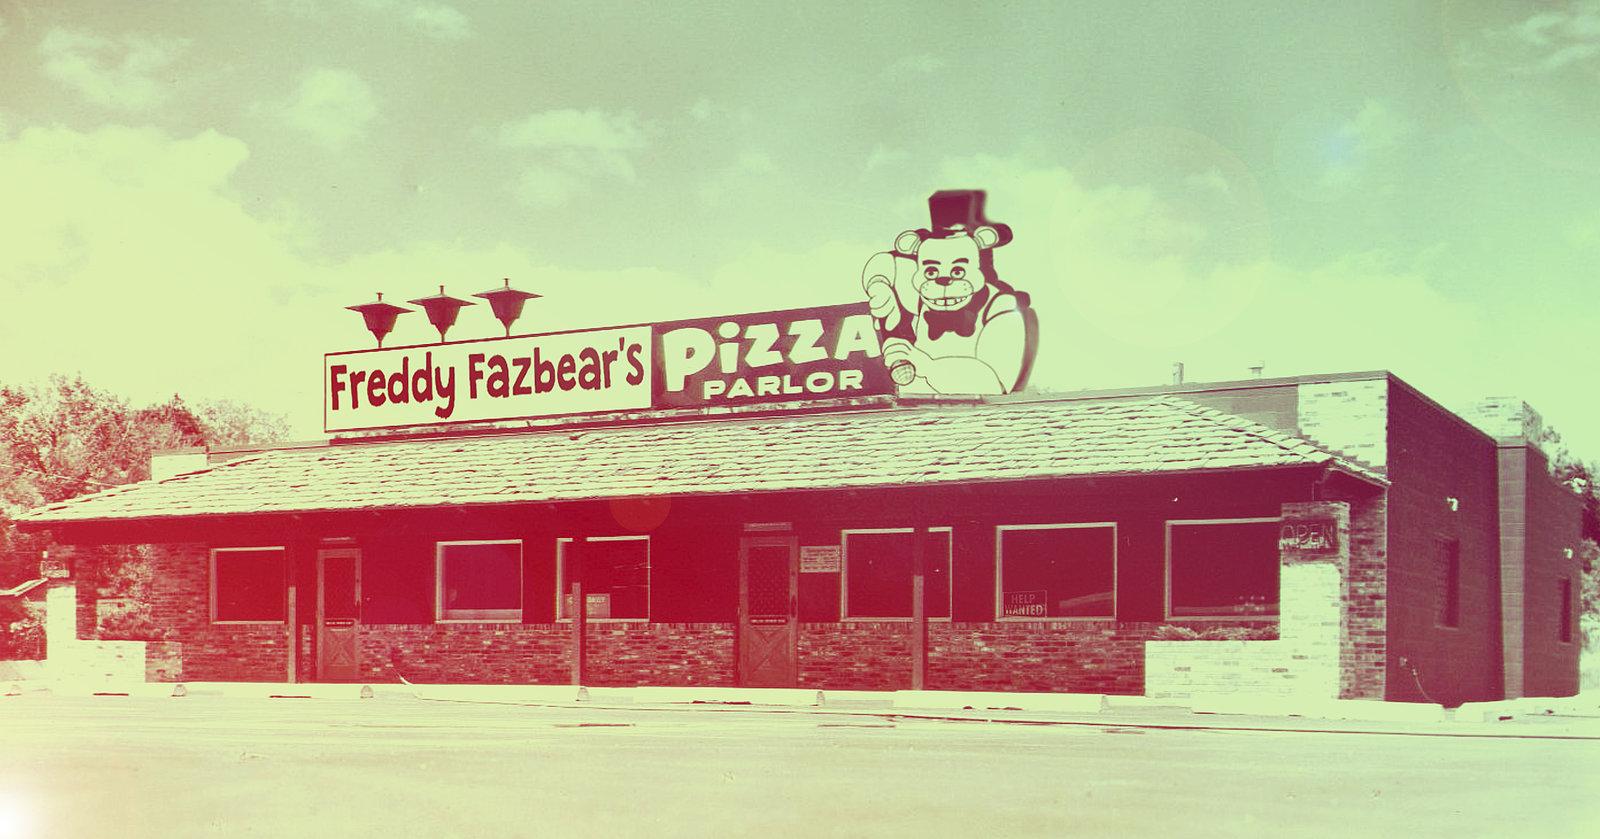 Tags freddy fazbears pizza google maps freddy fazbears pizza google